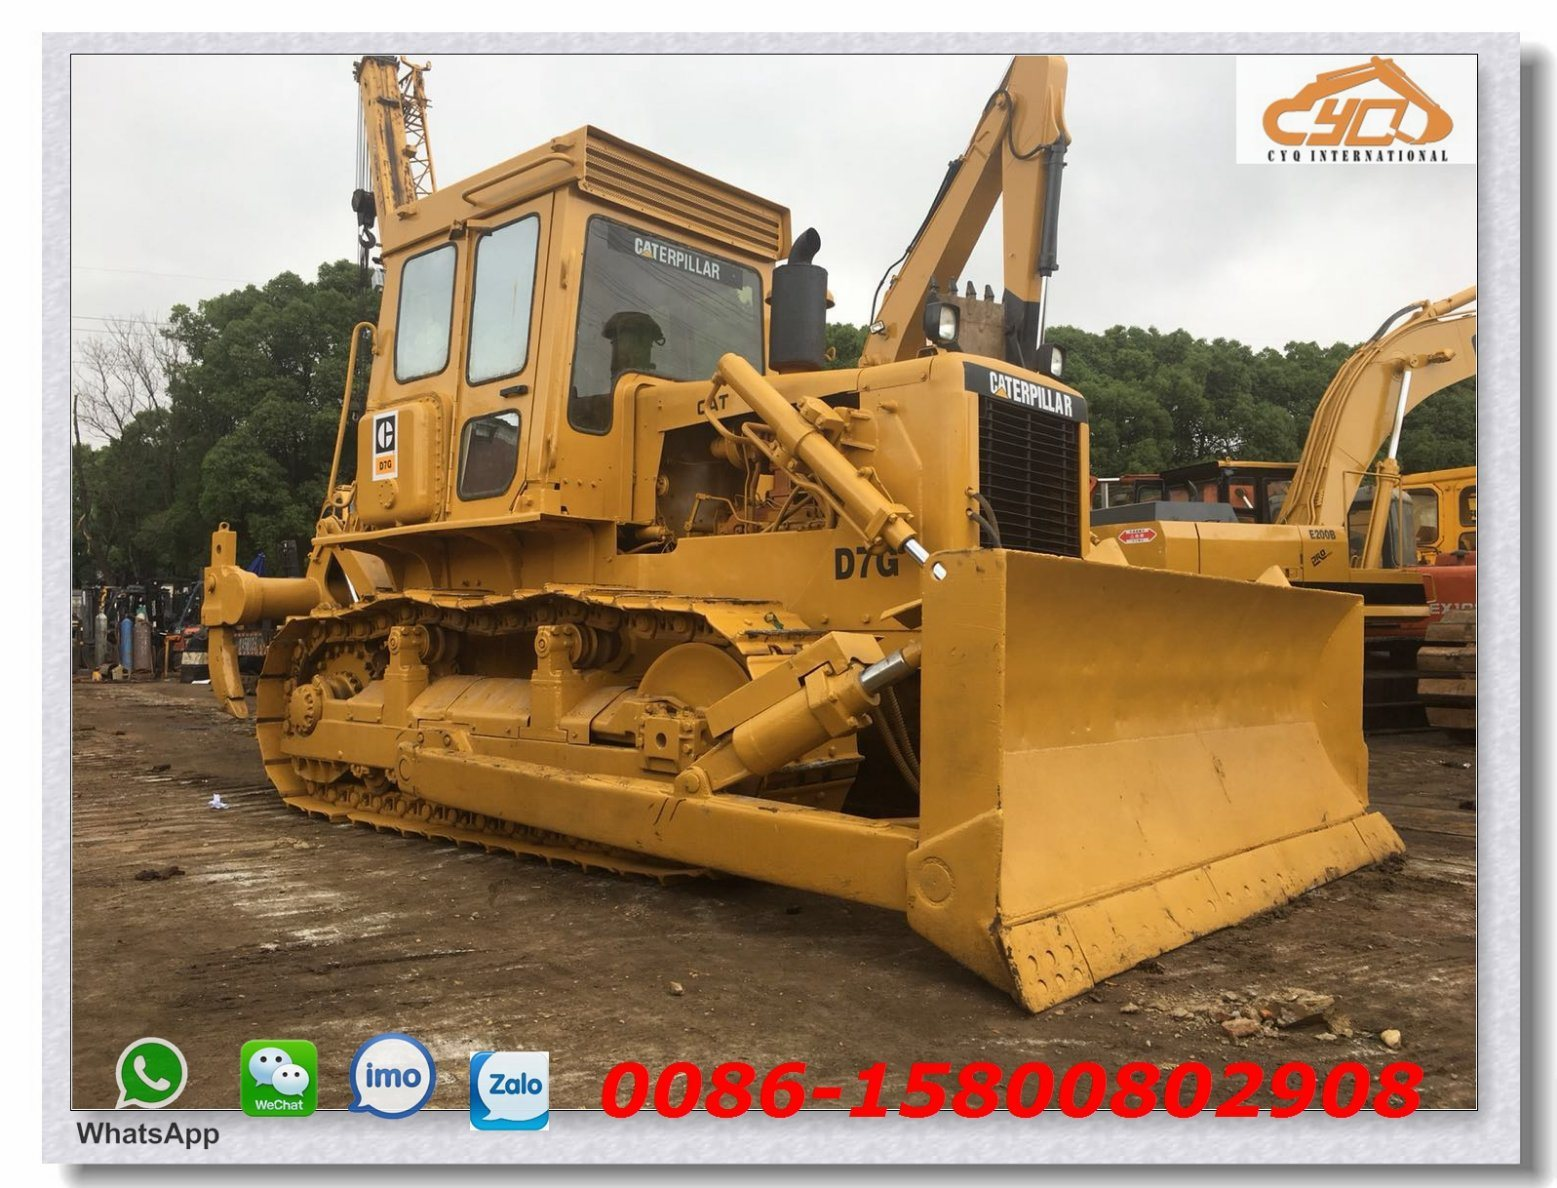 [Hot Item] Second Hand Bulldozer Cat D7g Bulldozer Cat D3, D4, D5, D6, D7,  D8 Dozer